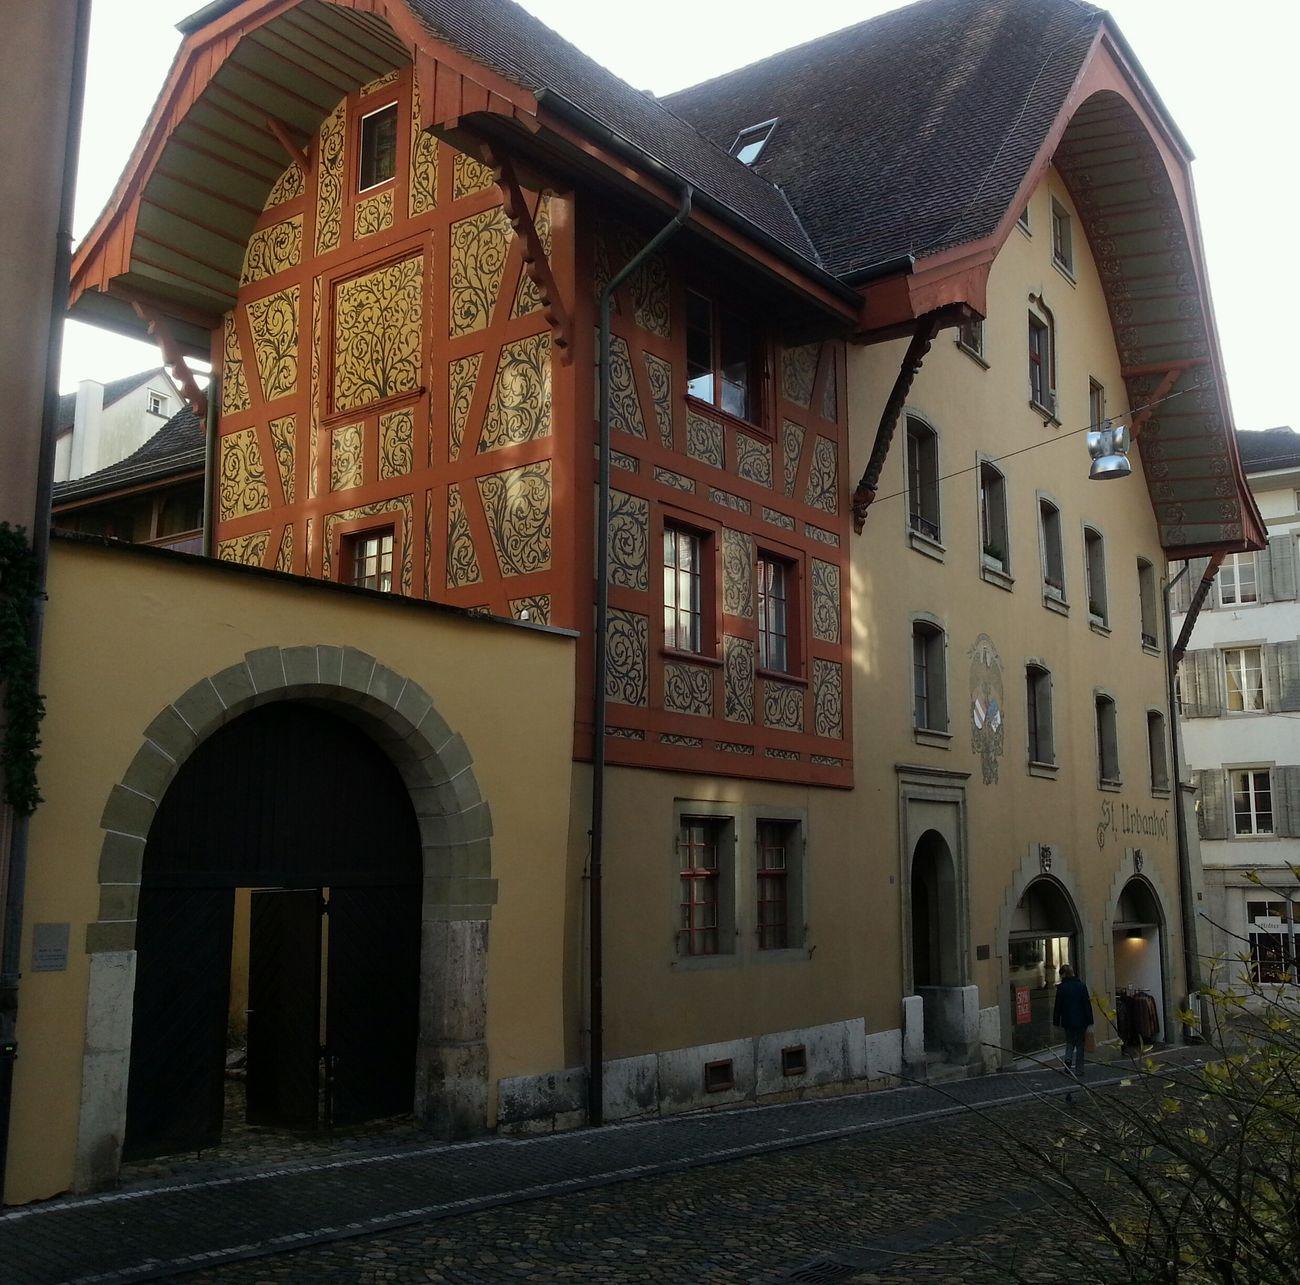 Zofingen Architecture Old Architecture